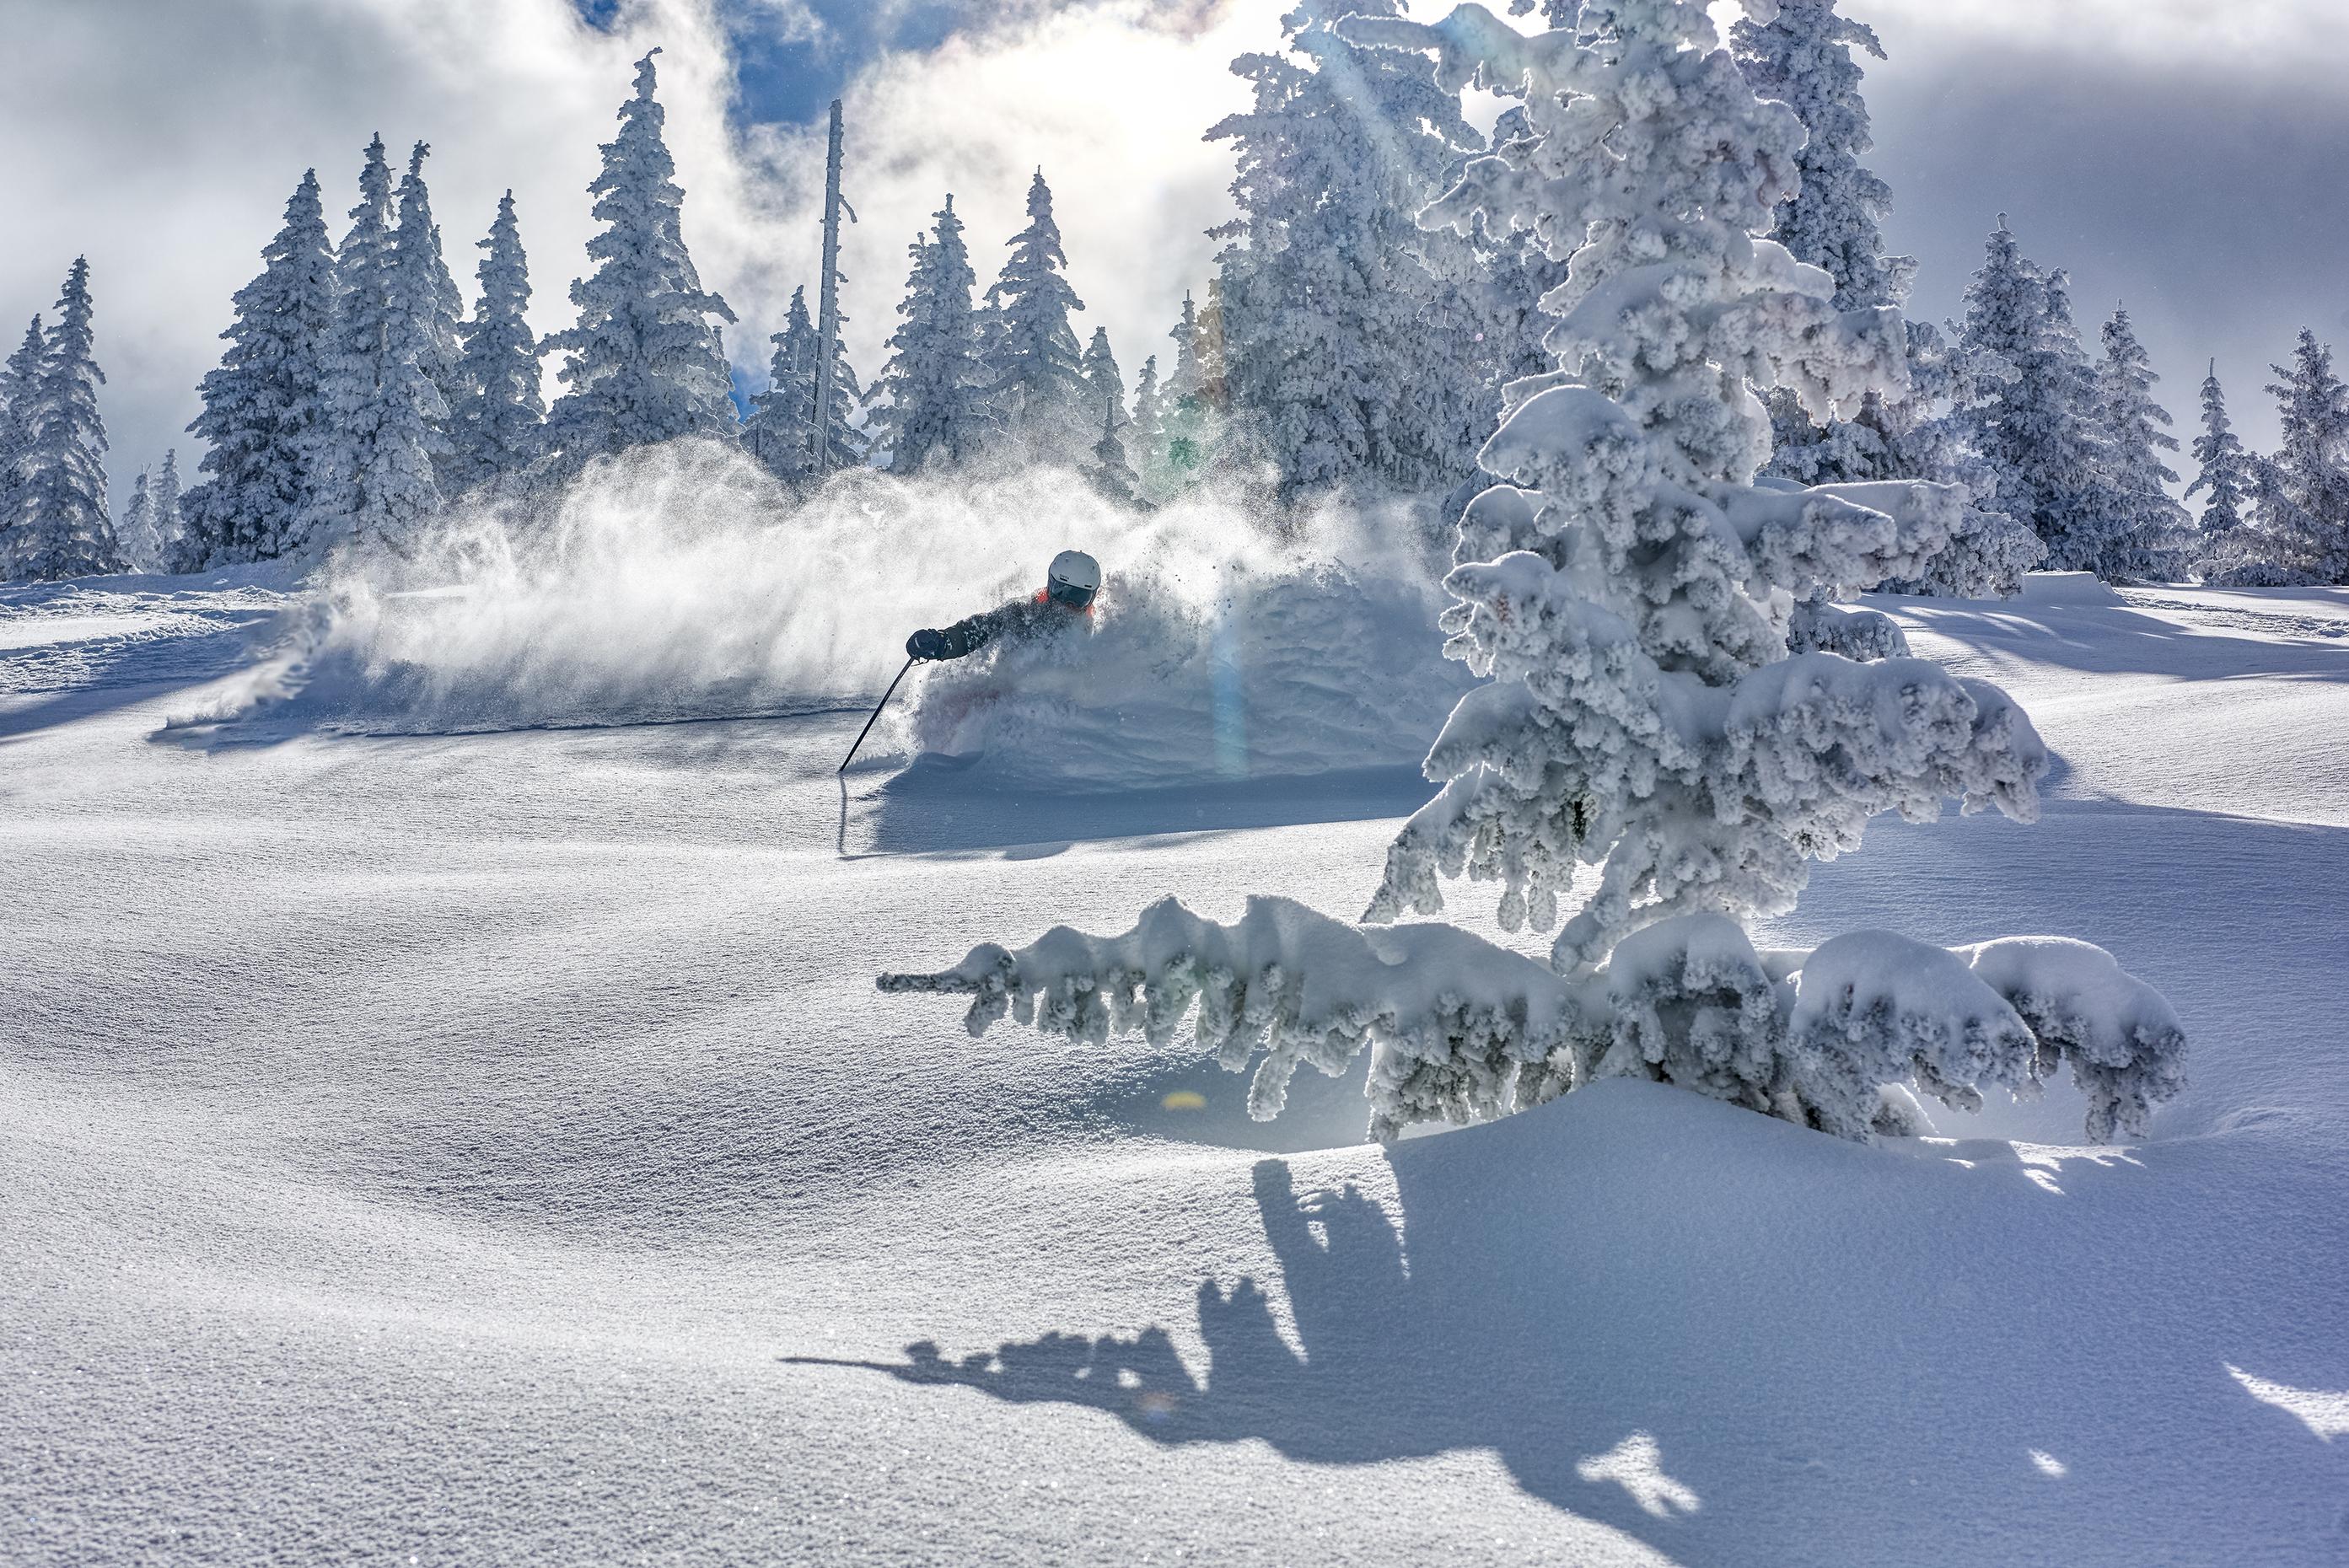 Ski Santa Fe on flagstaff ski map, colorado ski map, taos ski map, pamporovo piste map, new mexico ski map, red river nm map, jackson hole ski map, aspen ski map, red river ski area map, mont tremblant ski map,